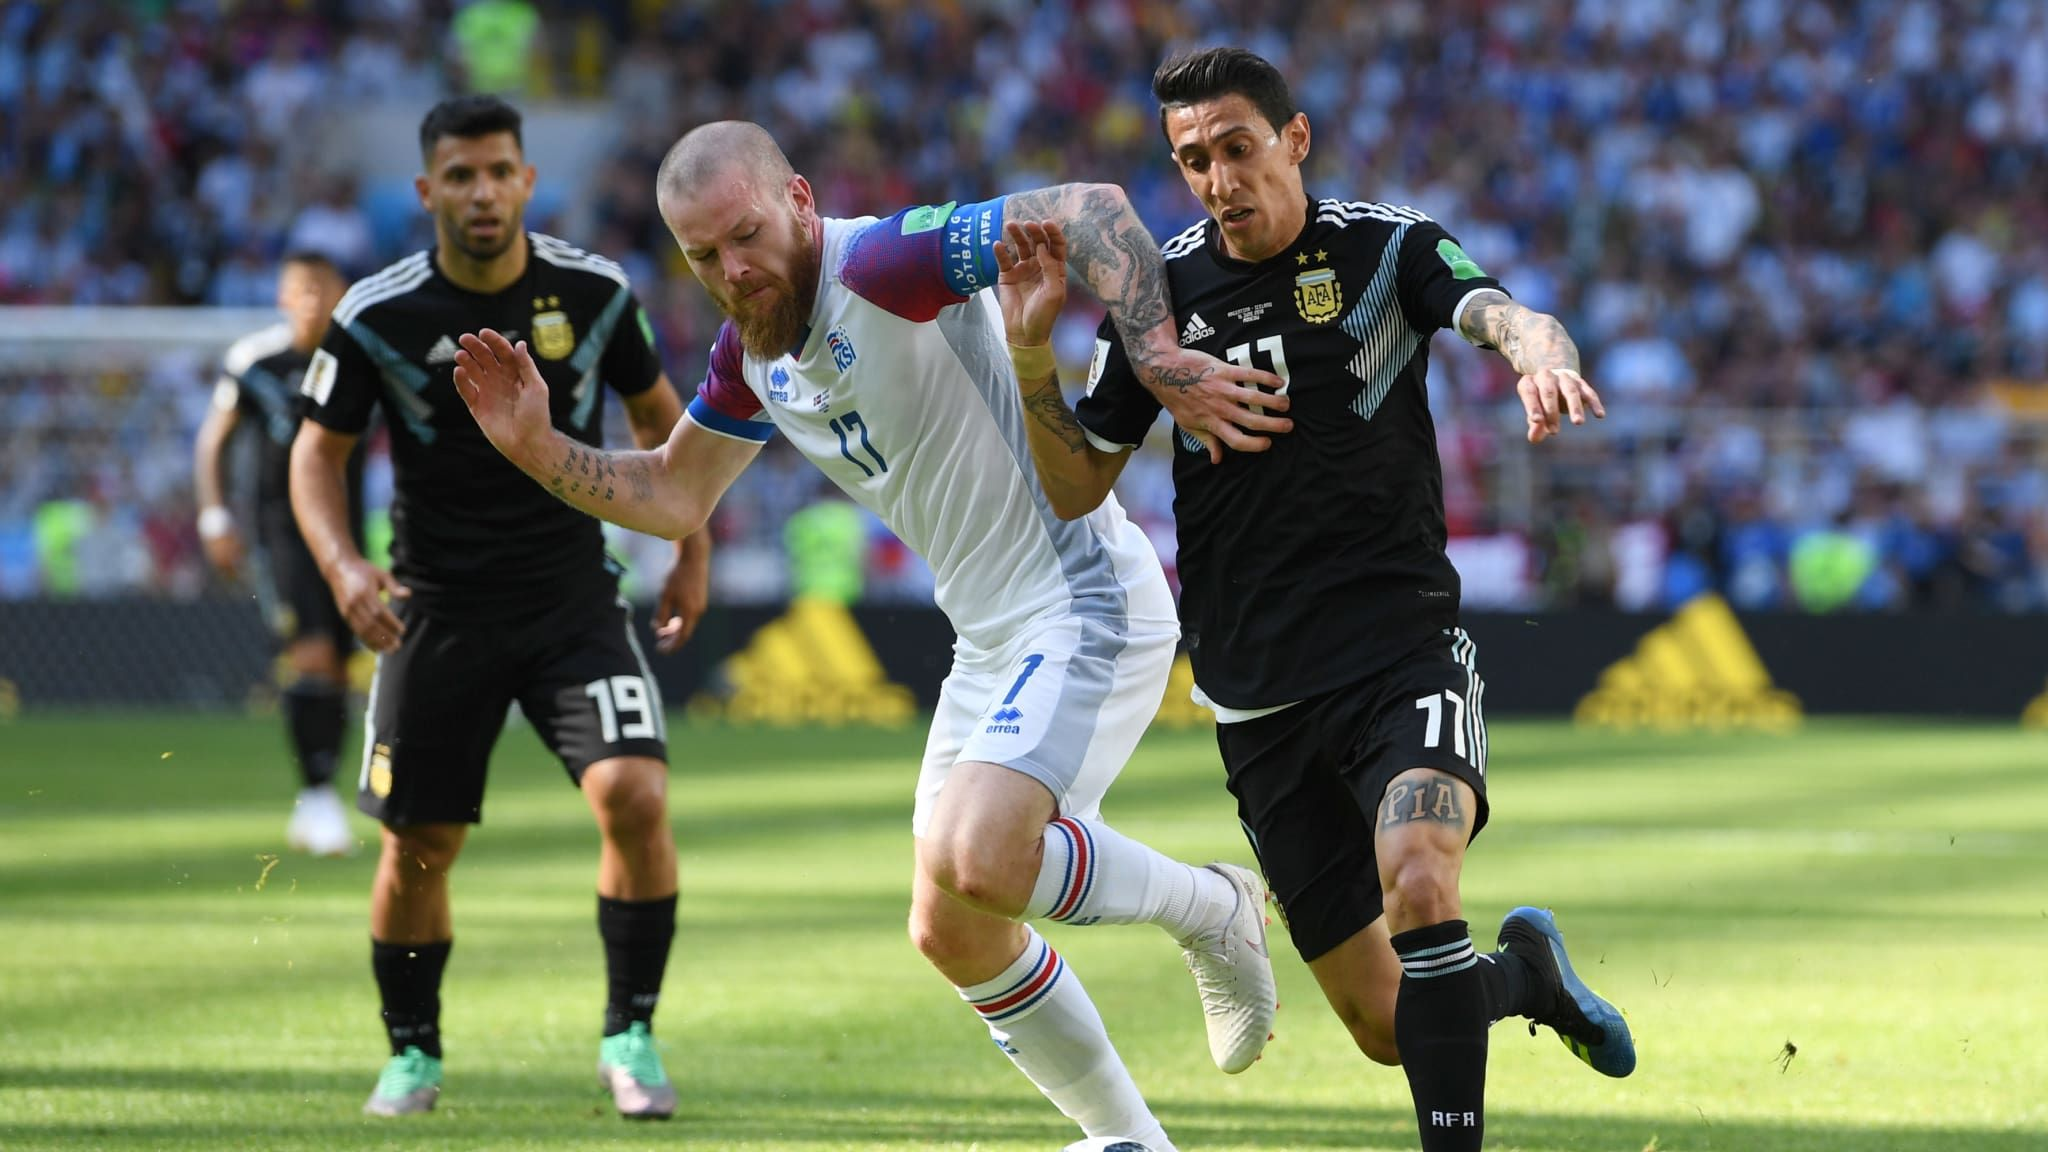 Argentina vs Islandia en el Mundial de Rusia - Crédito:fifa.com